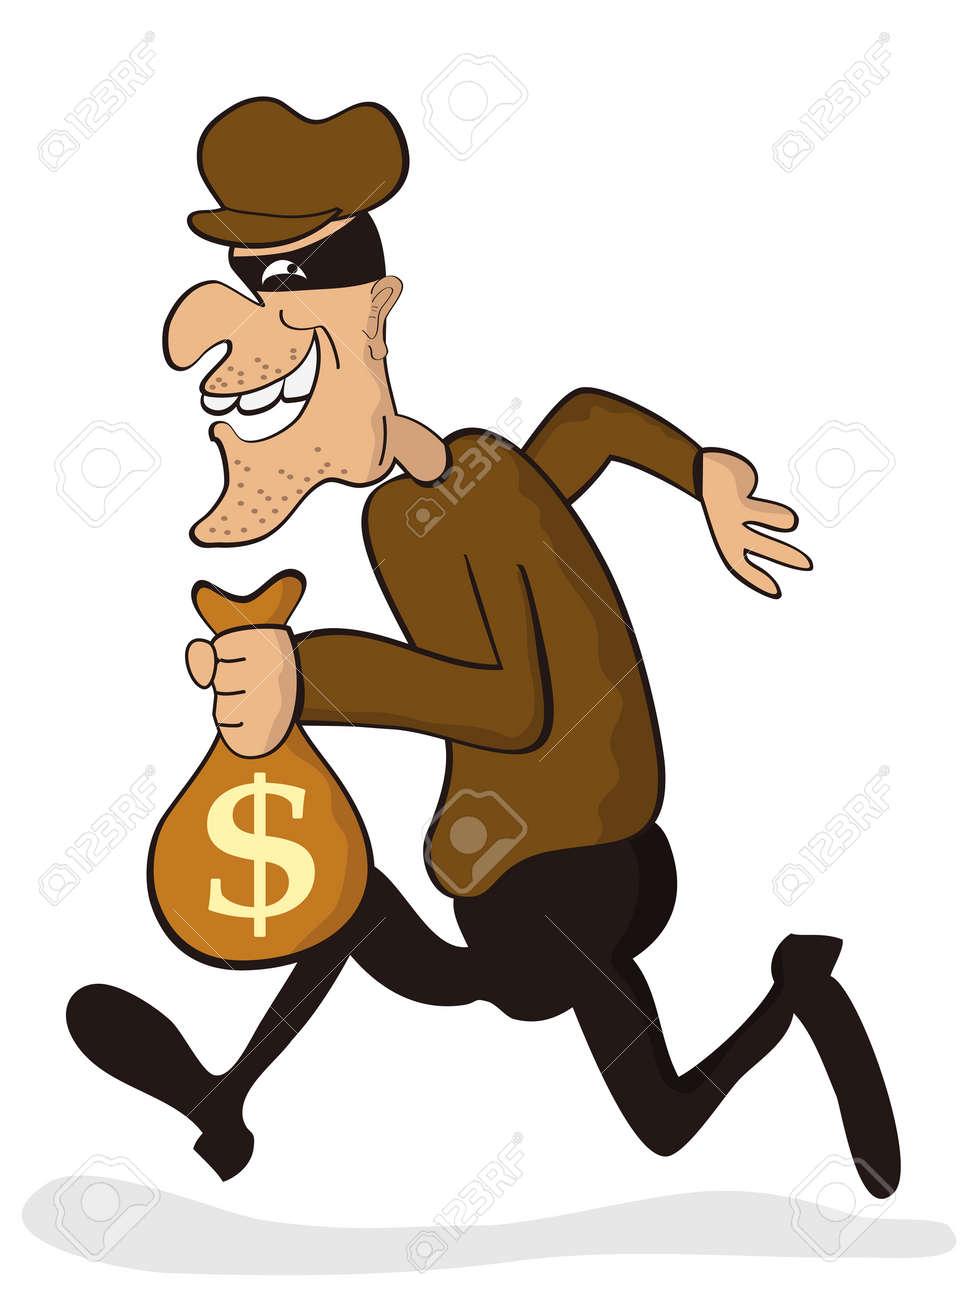 Cartoon Thief Running Cartoon Character of Thief